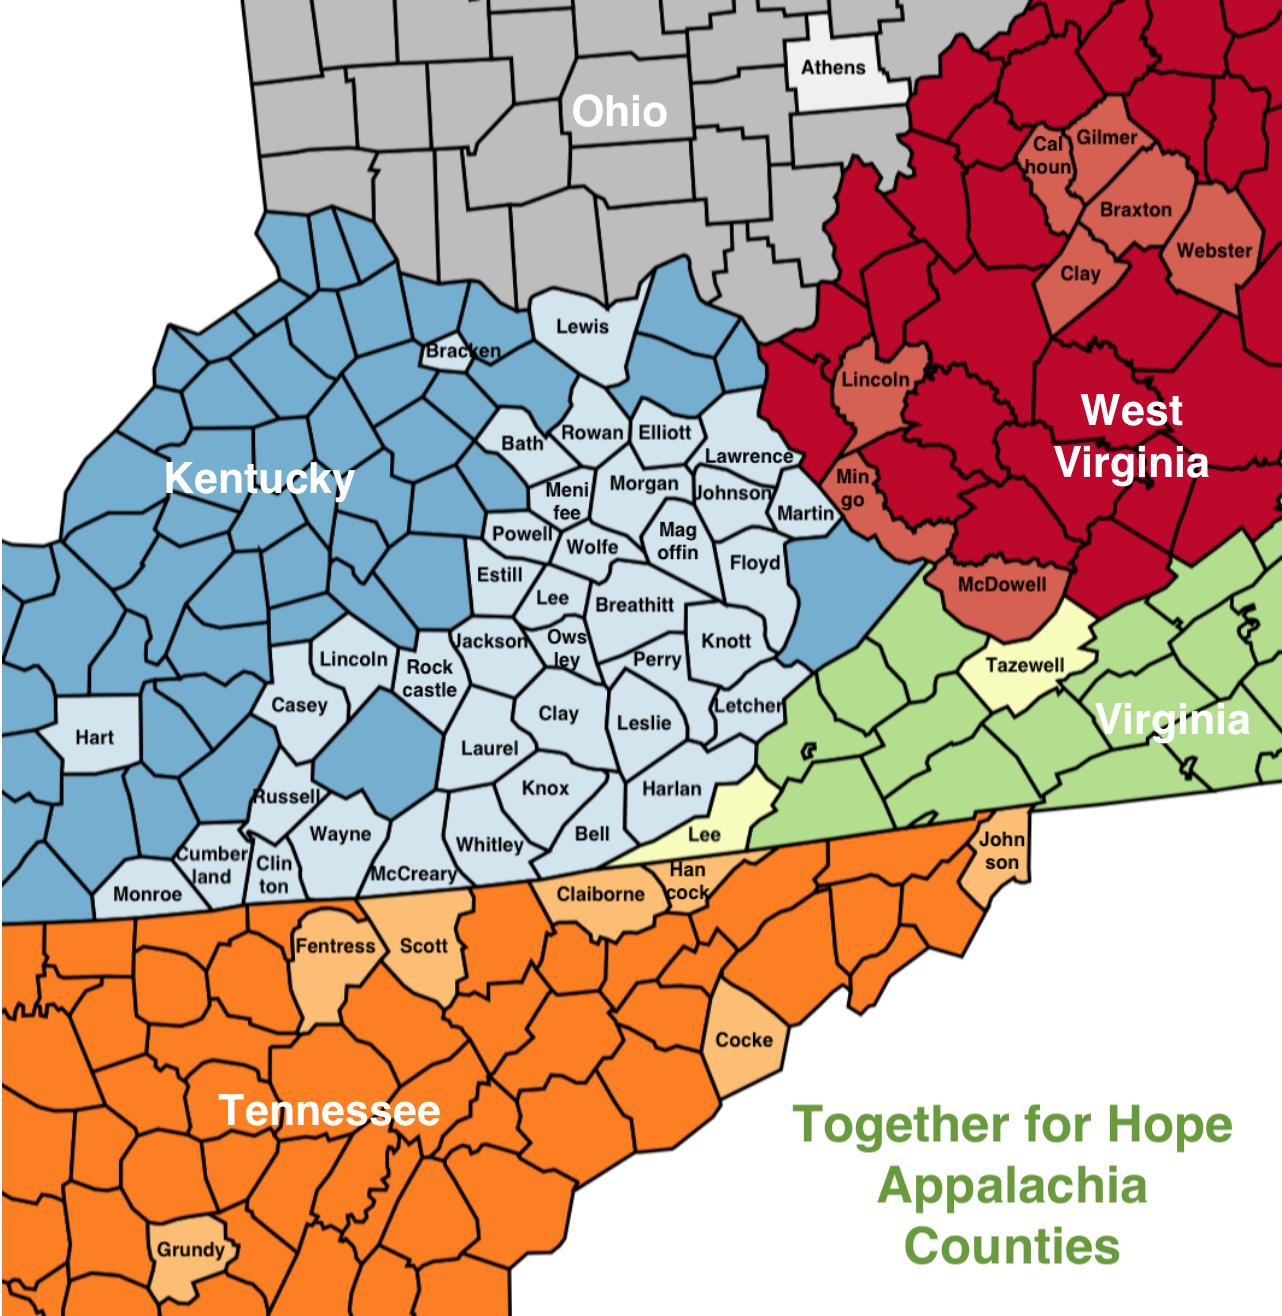 TFH+Appalachia+Counties+.png